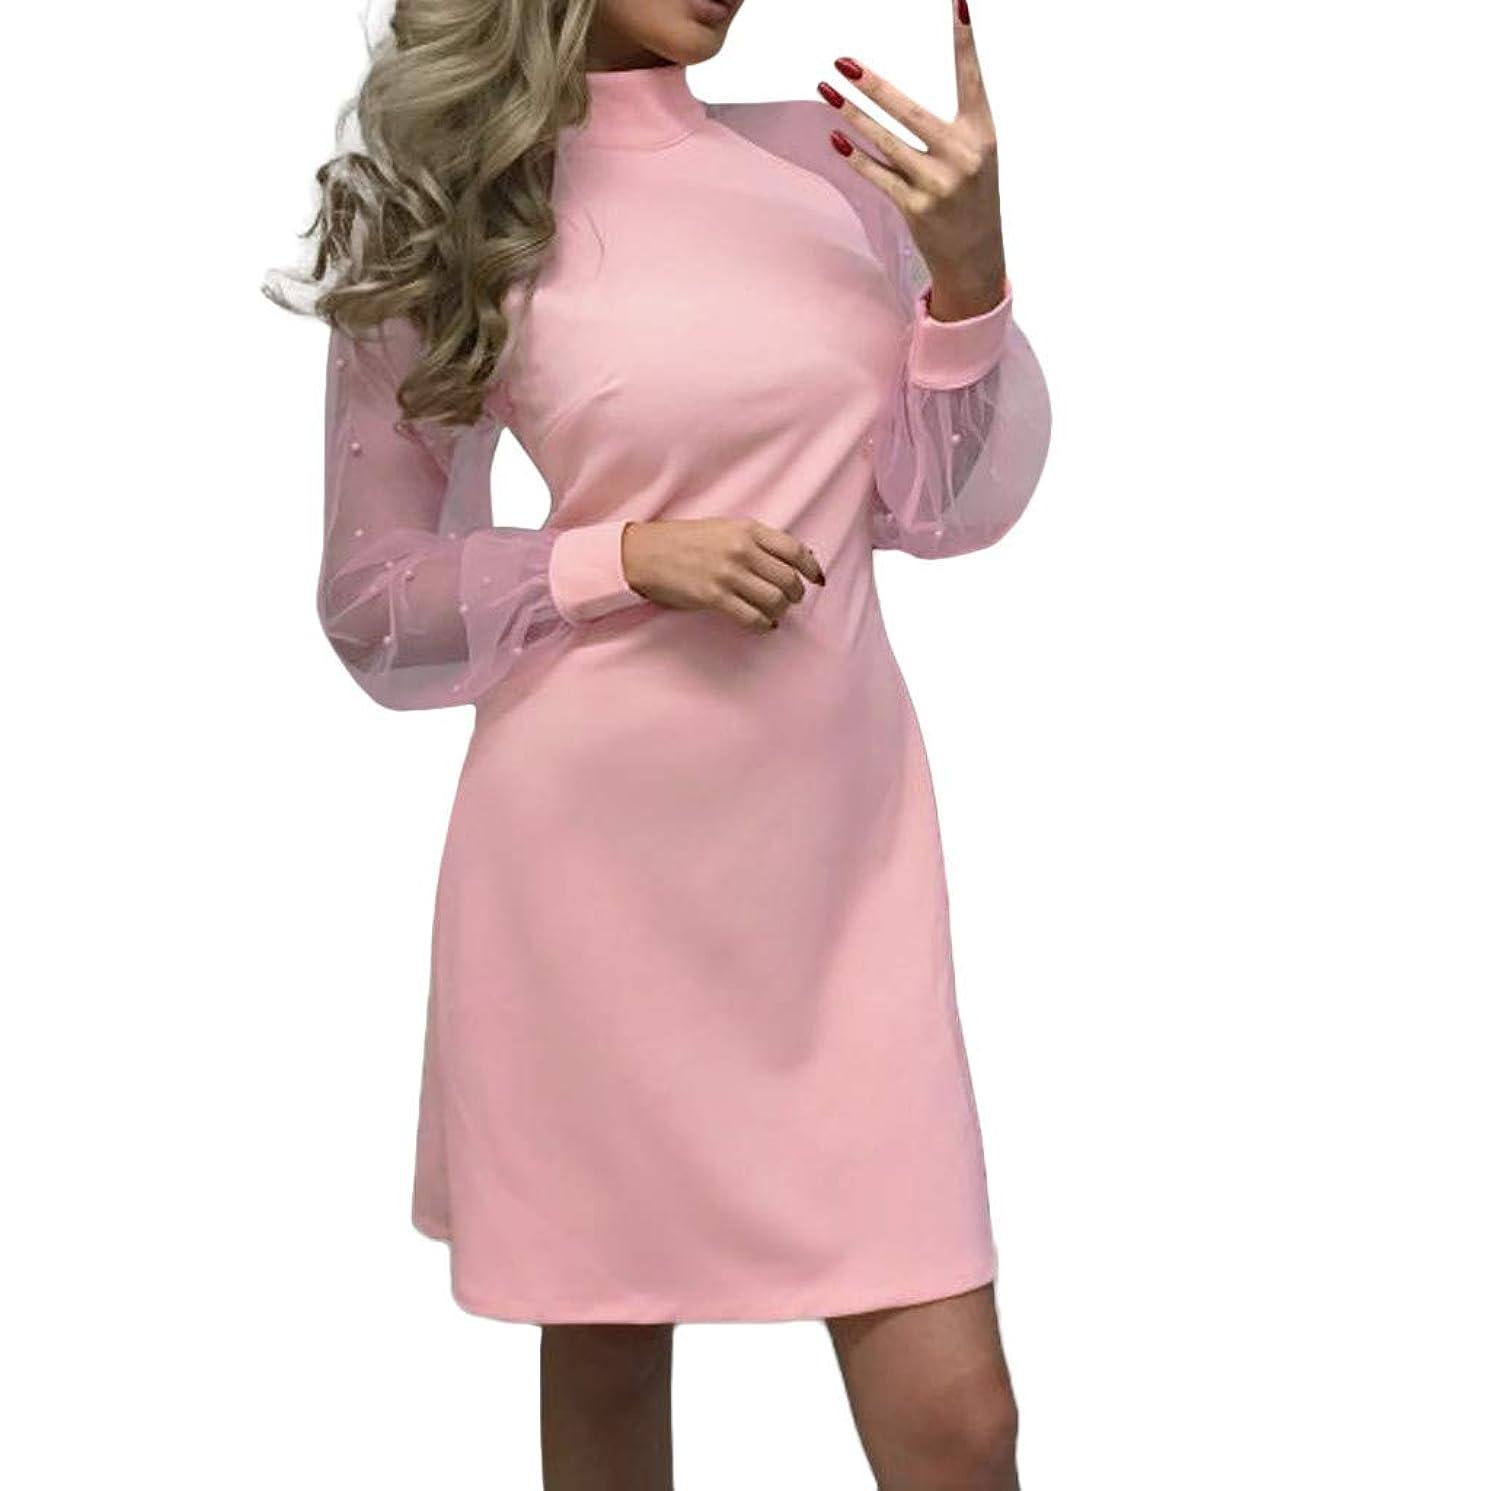 LEXUPA Women's Pearl Beading Mesh Sleeve Dress Long Sleeve A-Line Mini Party Dress